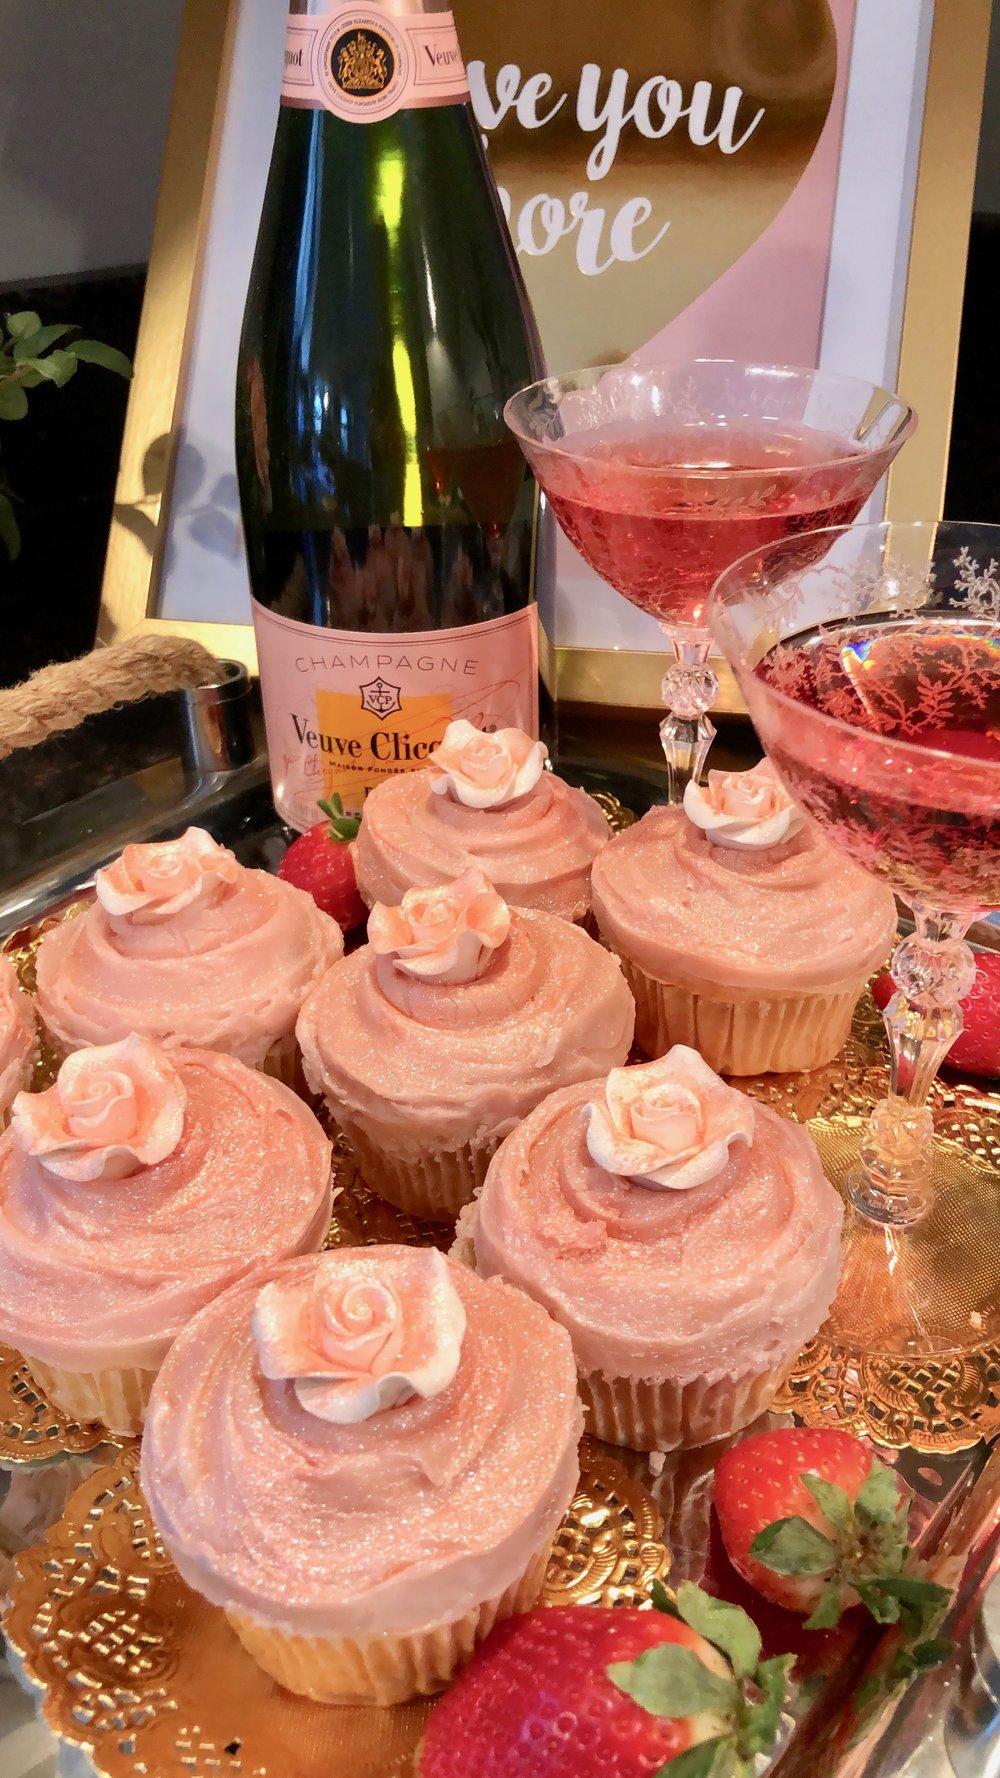 Veuve Clicquot and pink Champagne cupcake recipe